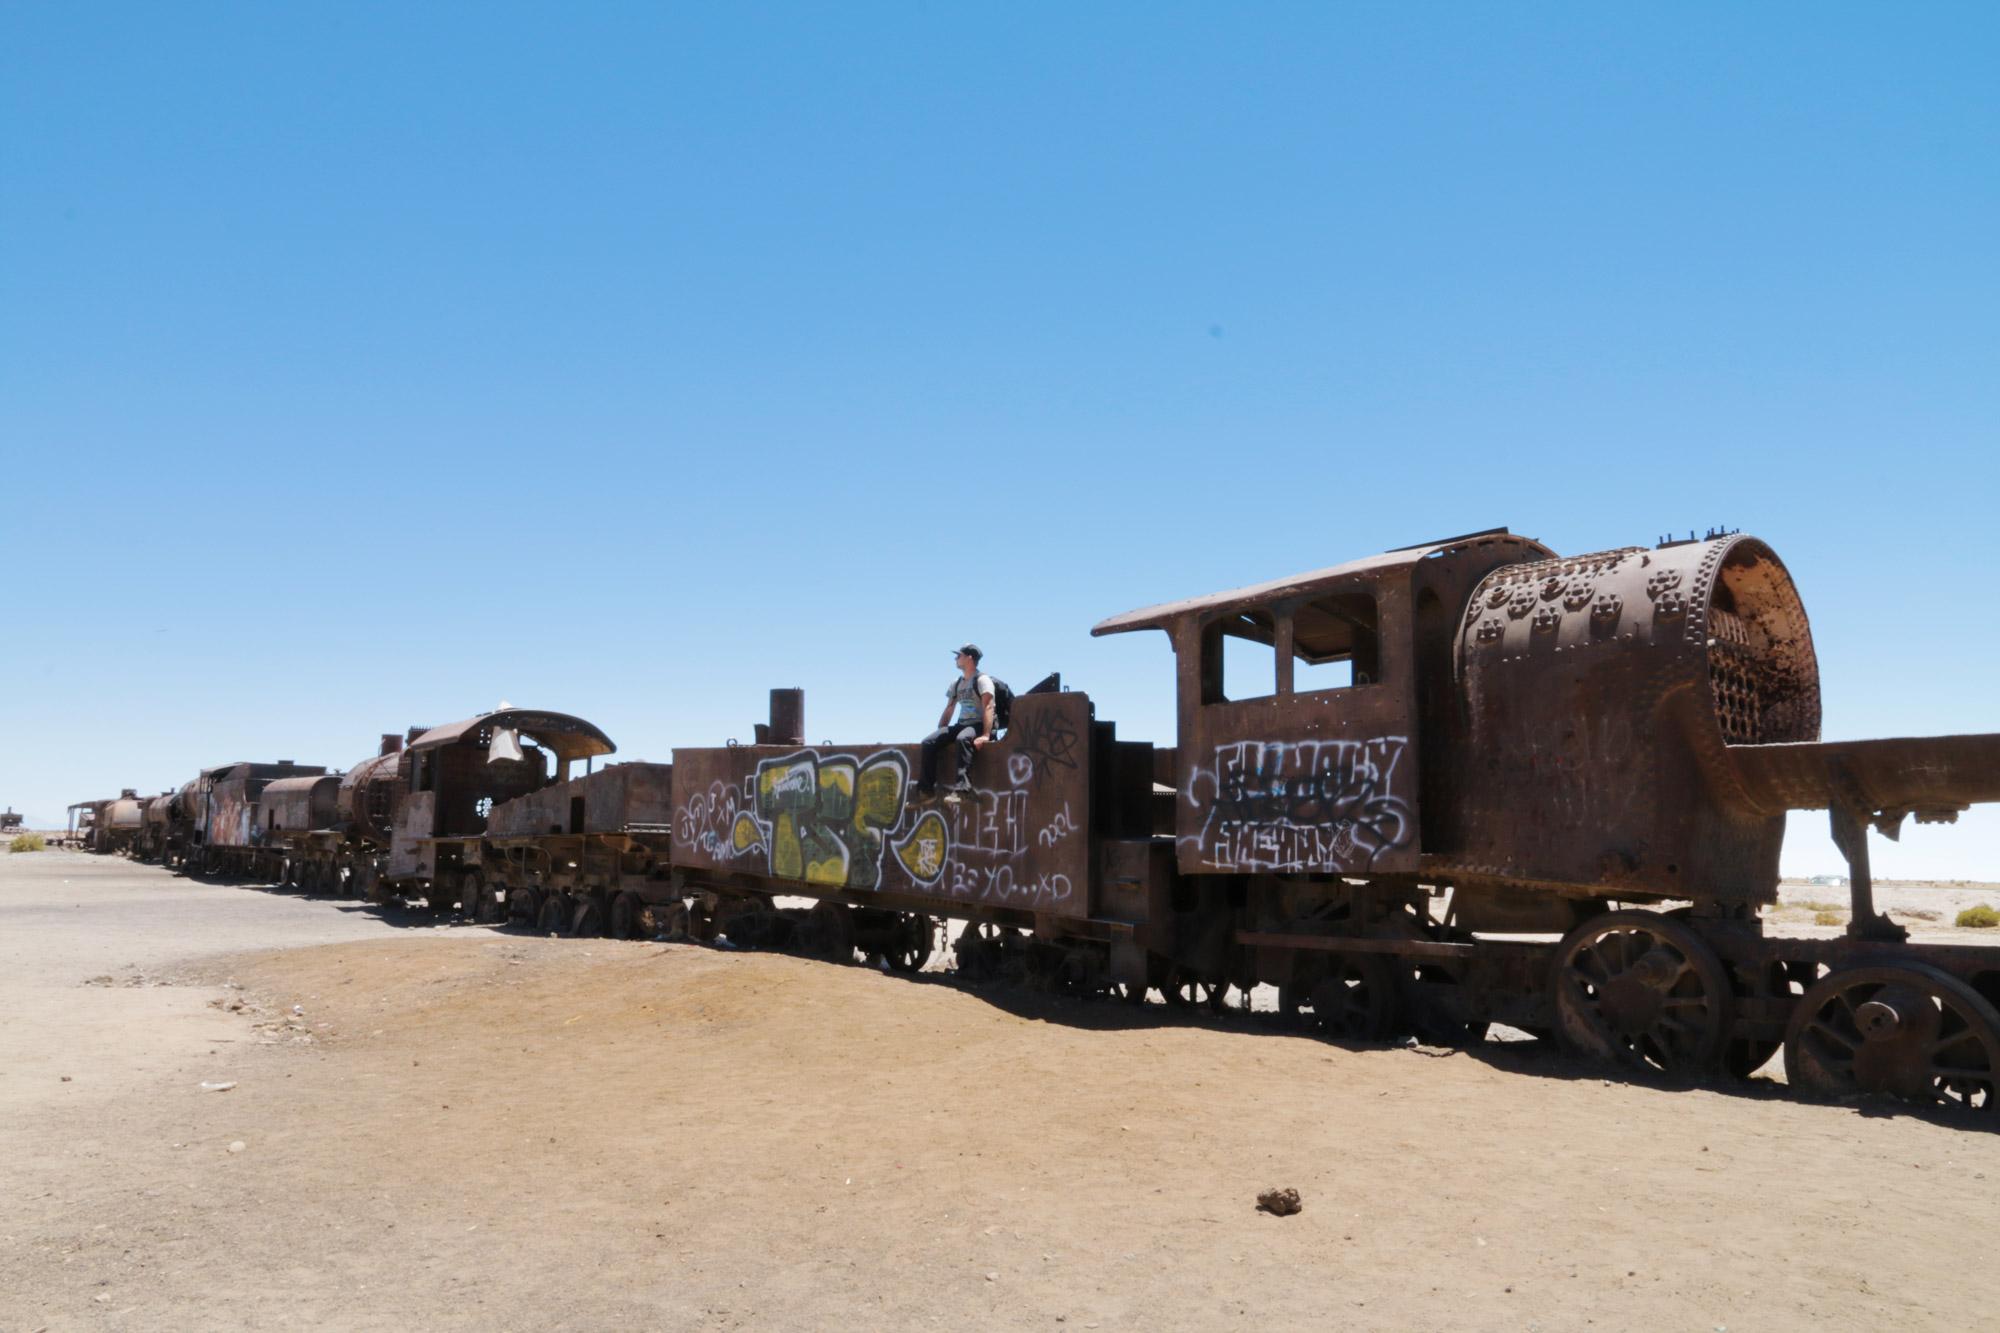 Reisverslag Bolivia: 's wereld grootste zoutvlakte - Cementerio de Trenes